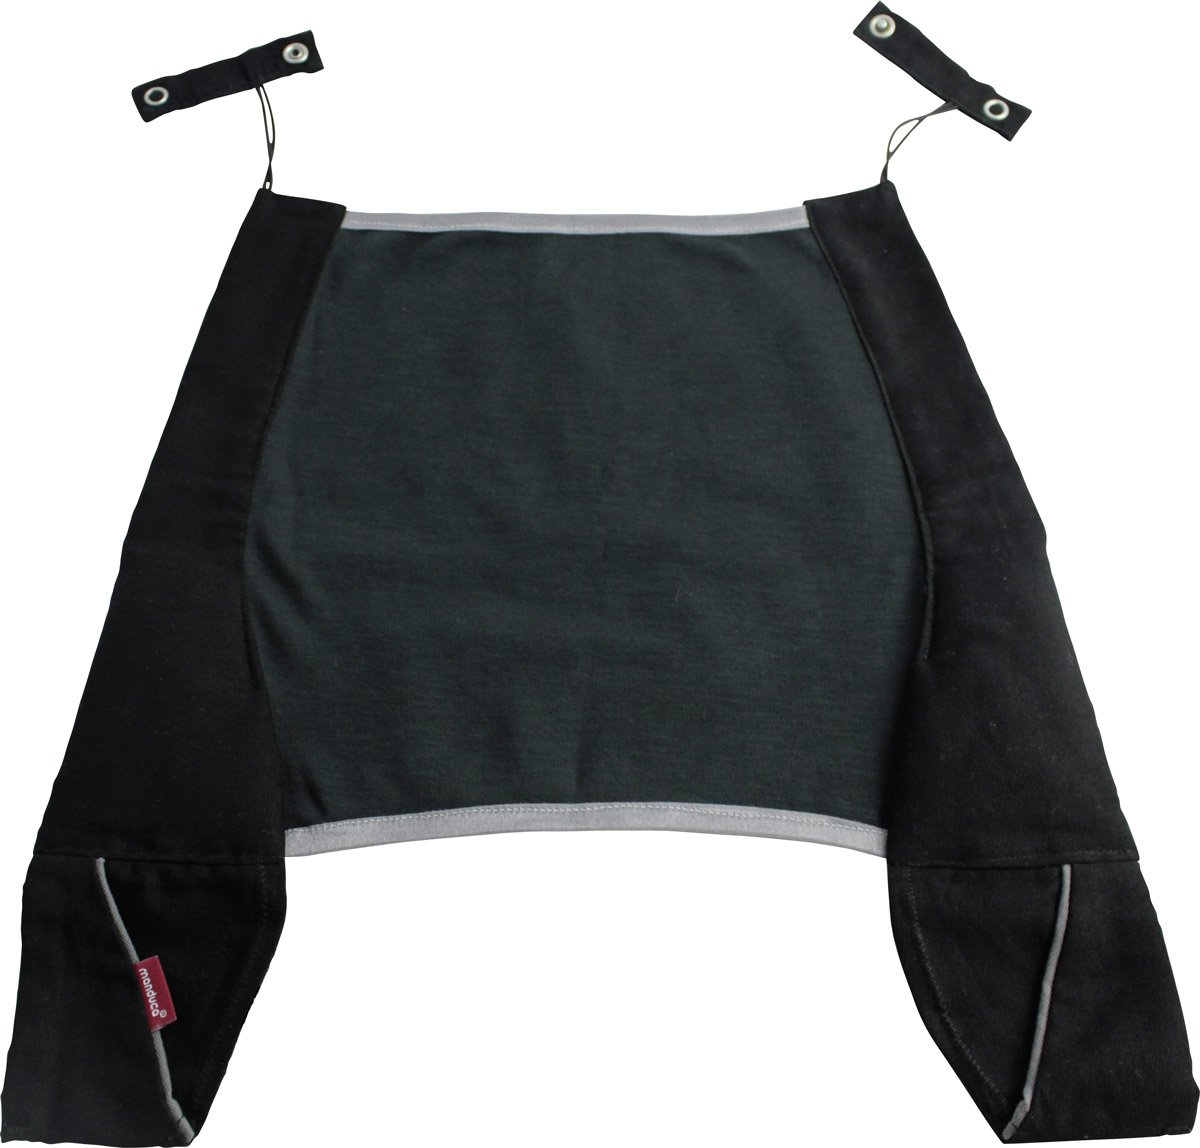 Manduca Mochila portabebé, color negro 222-44-15-001